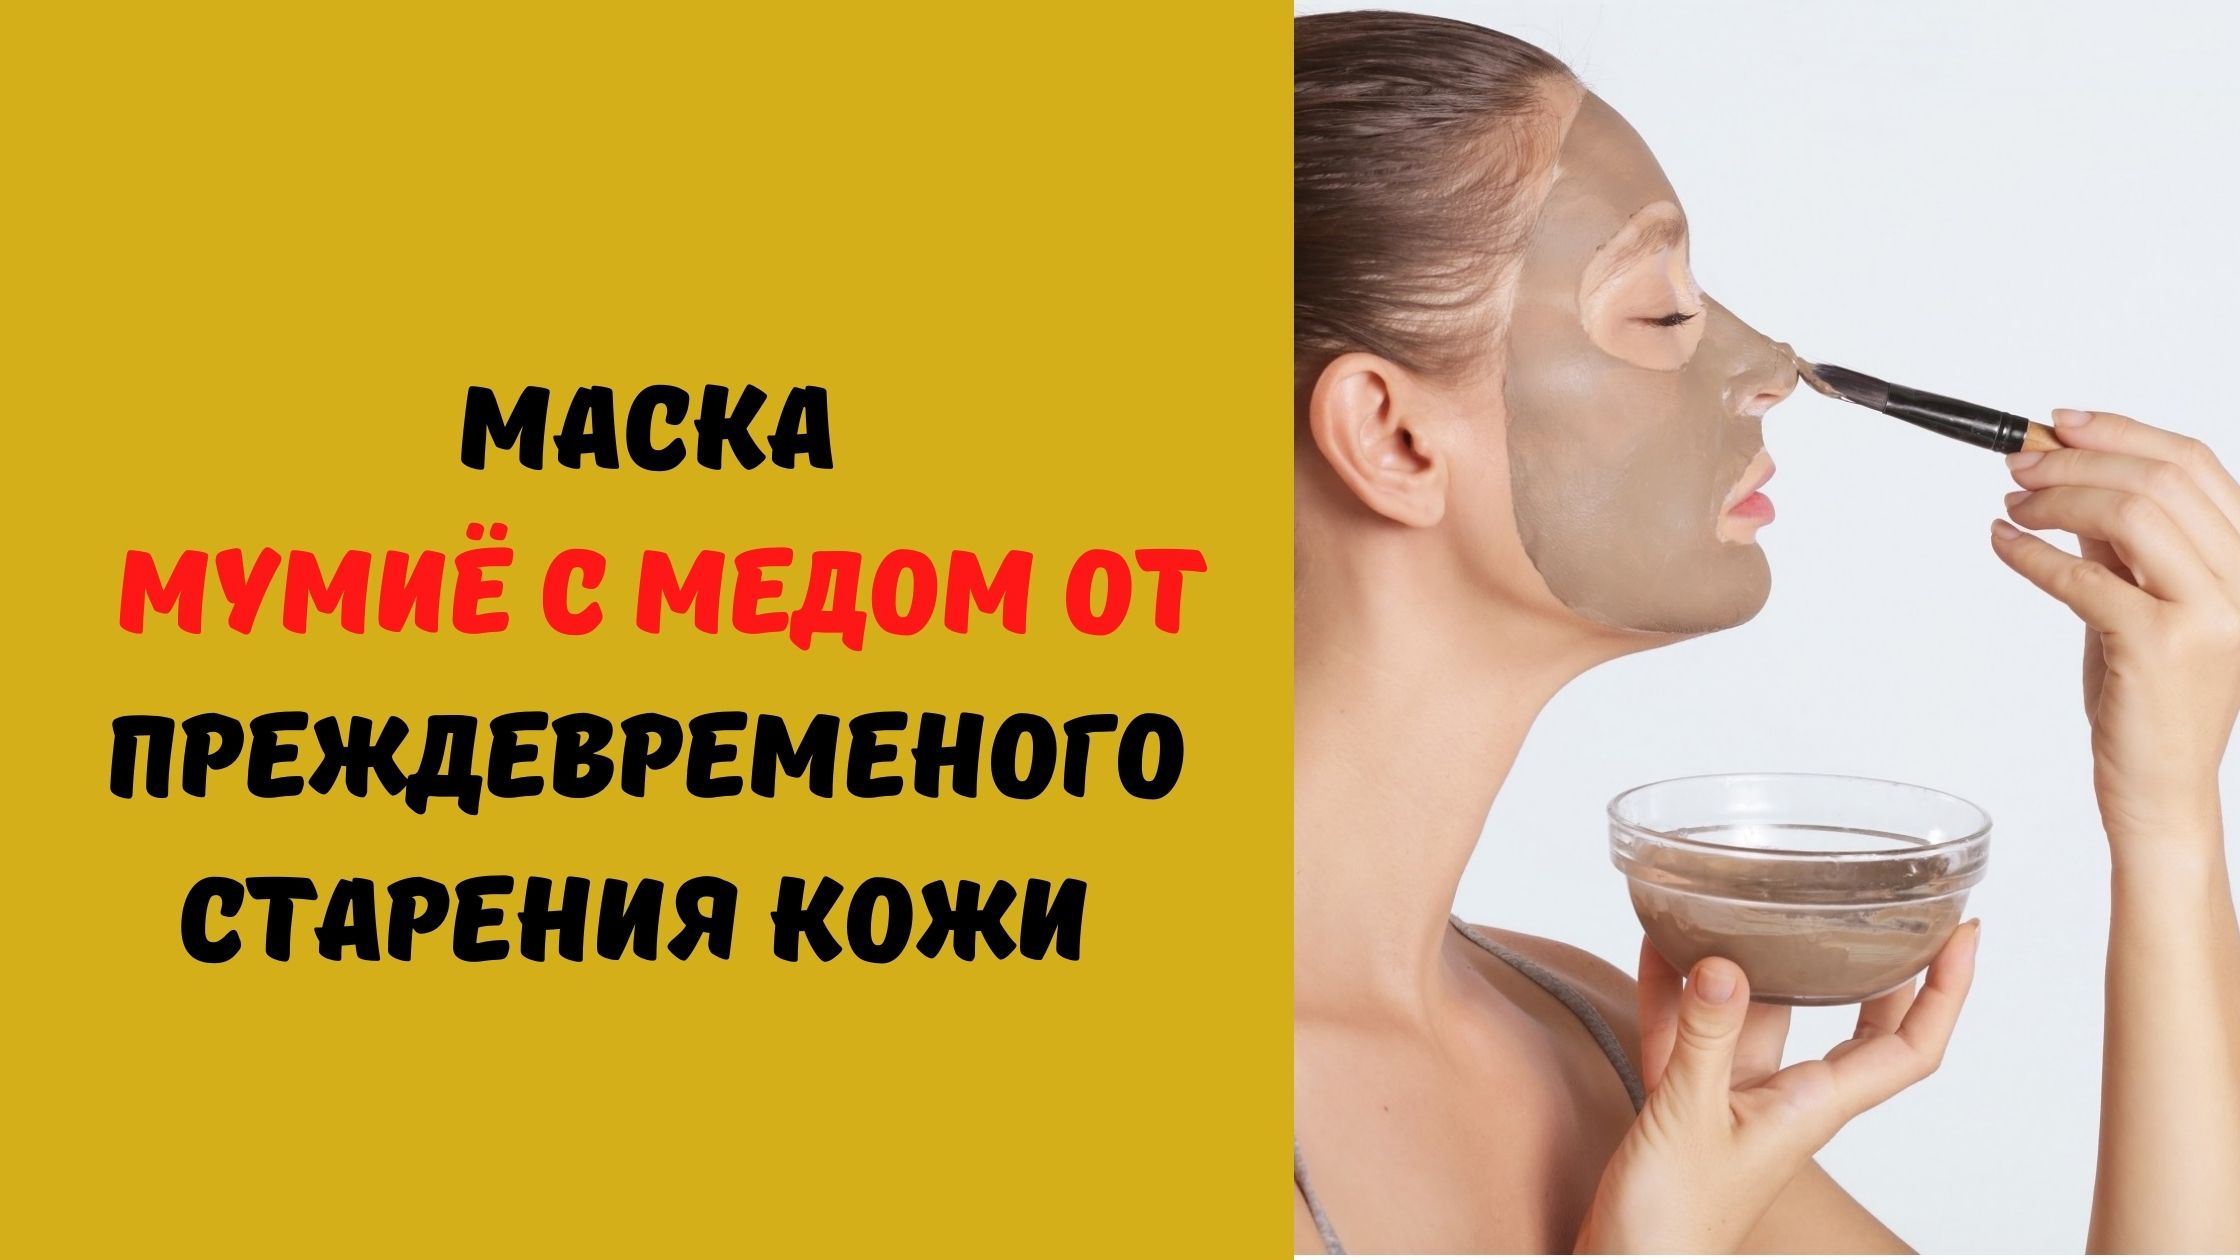 маска из мёда и мумиё